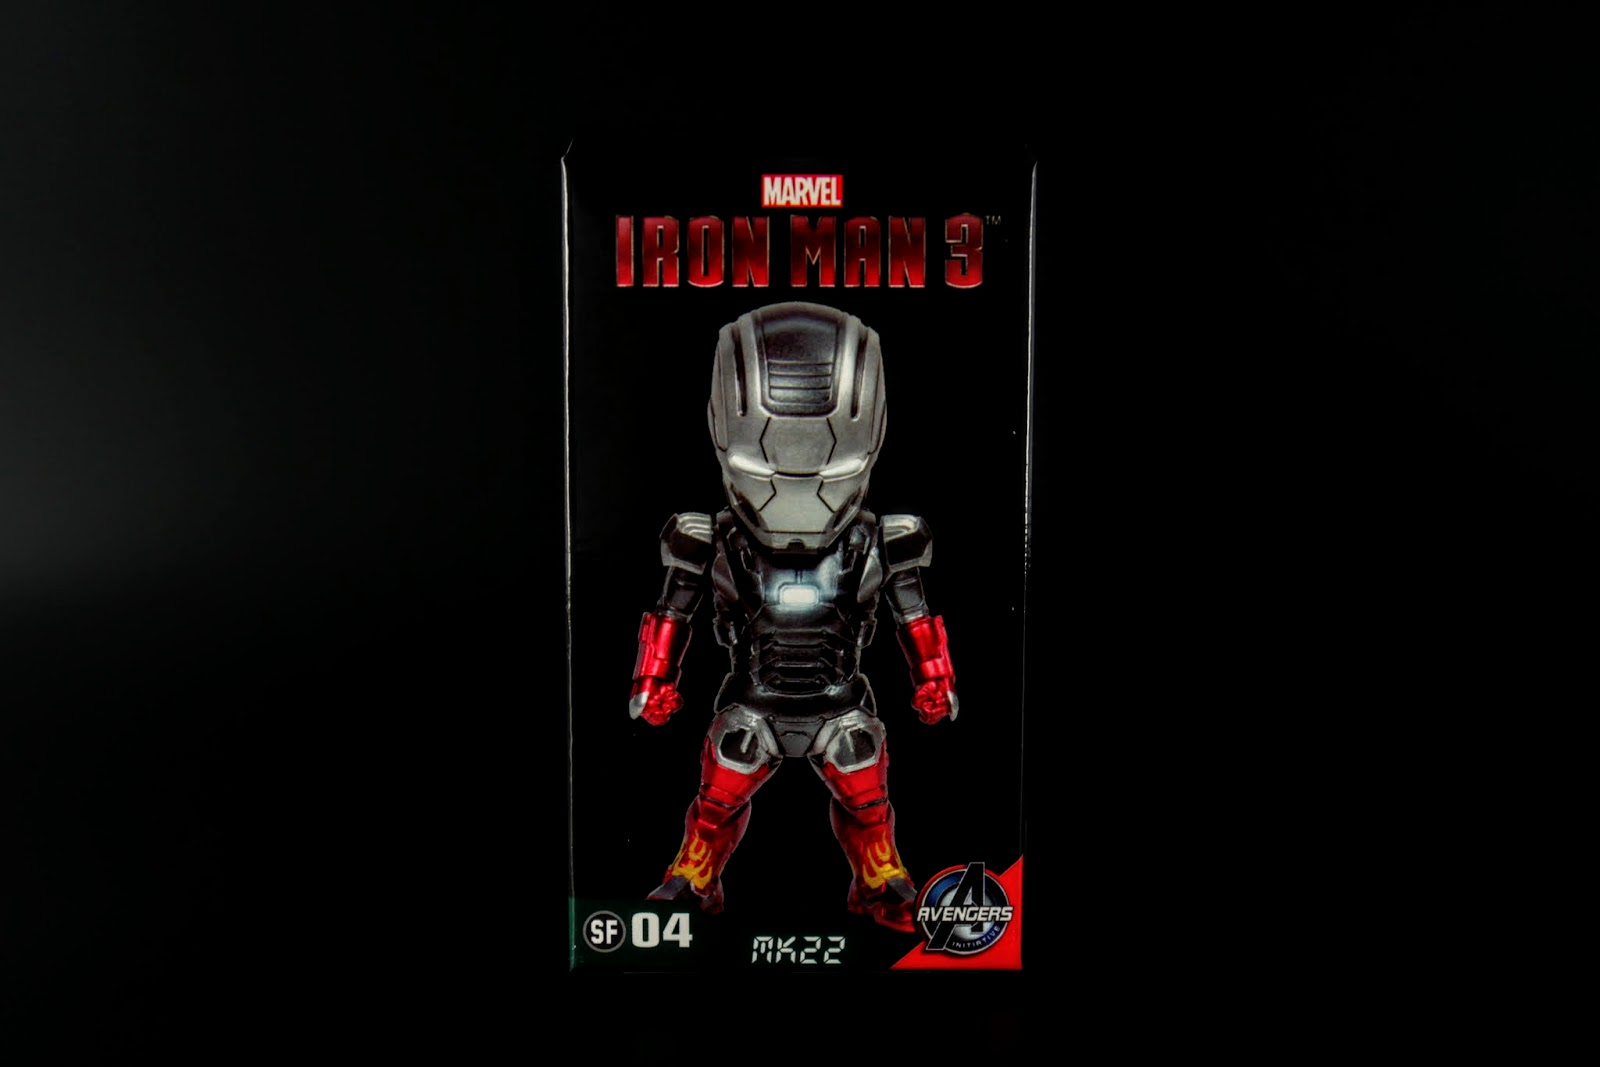 MK22-HOT RED,我本來以為它跟戰爭機器MK2是同一台